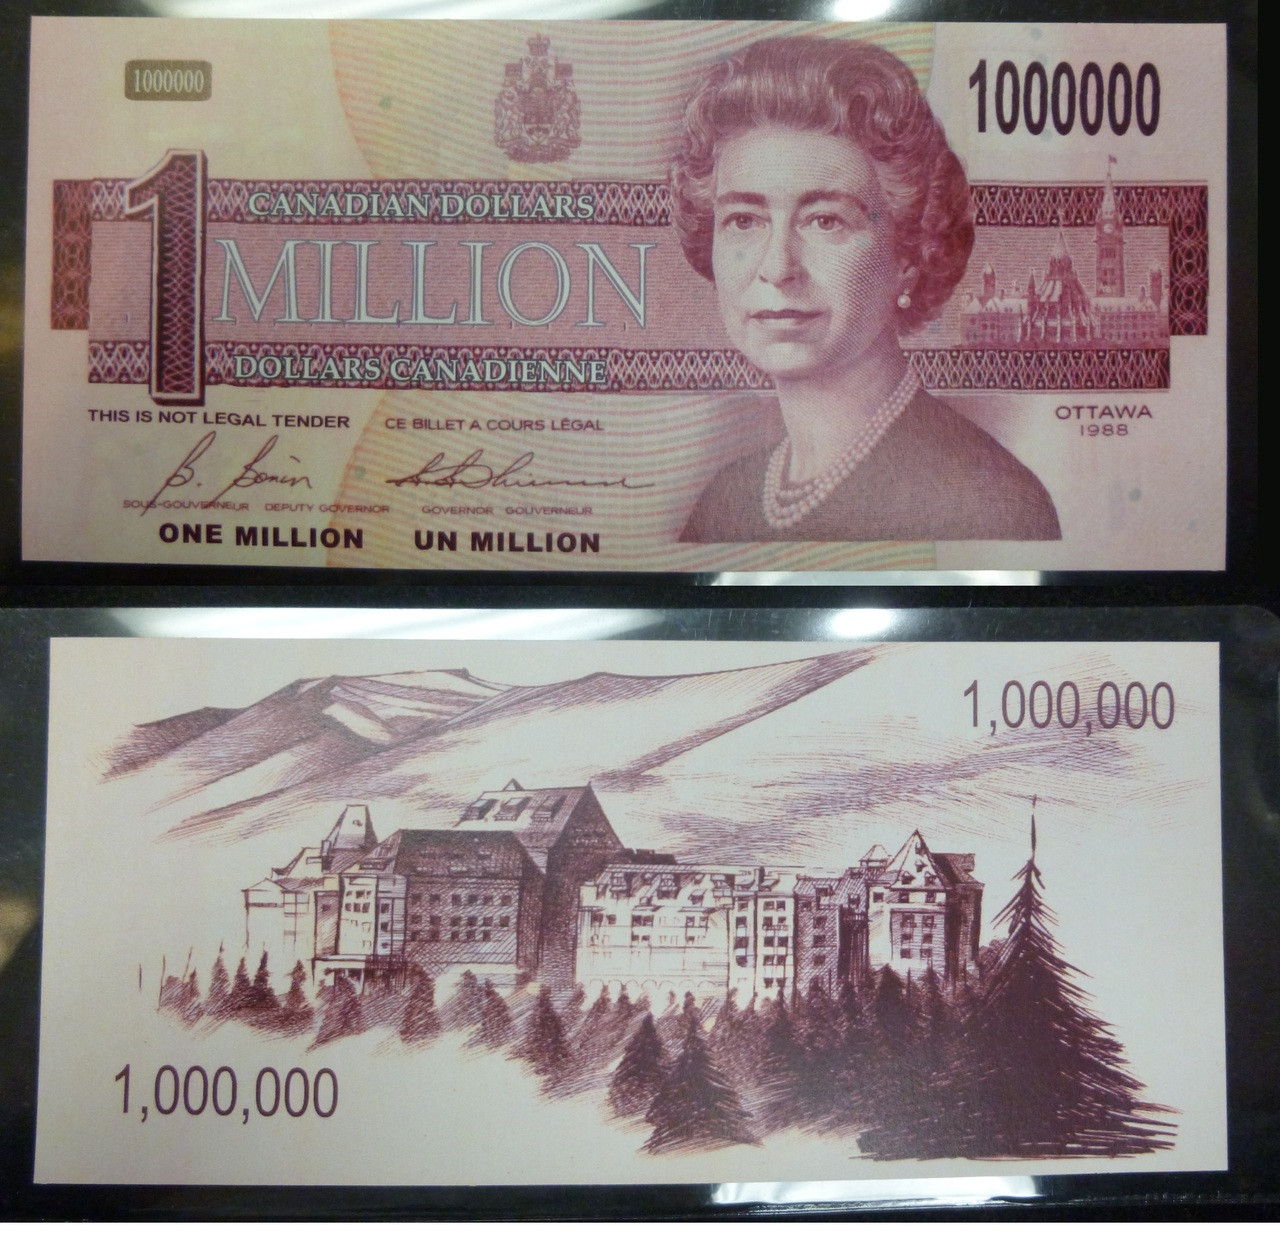 NOVELTY CANADIAN 1000000 MILLION DOLLAR BILL NOTE PAPER MONEY GAG GIFT